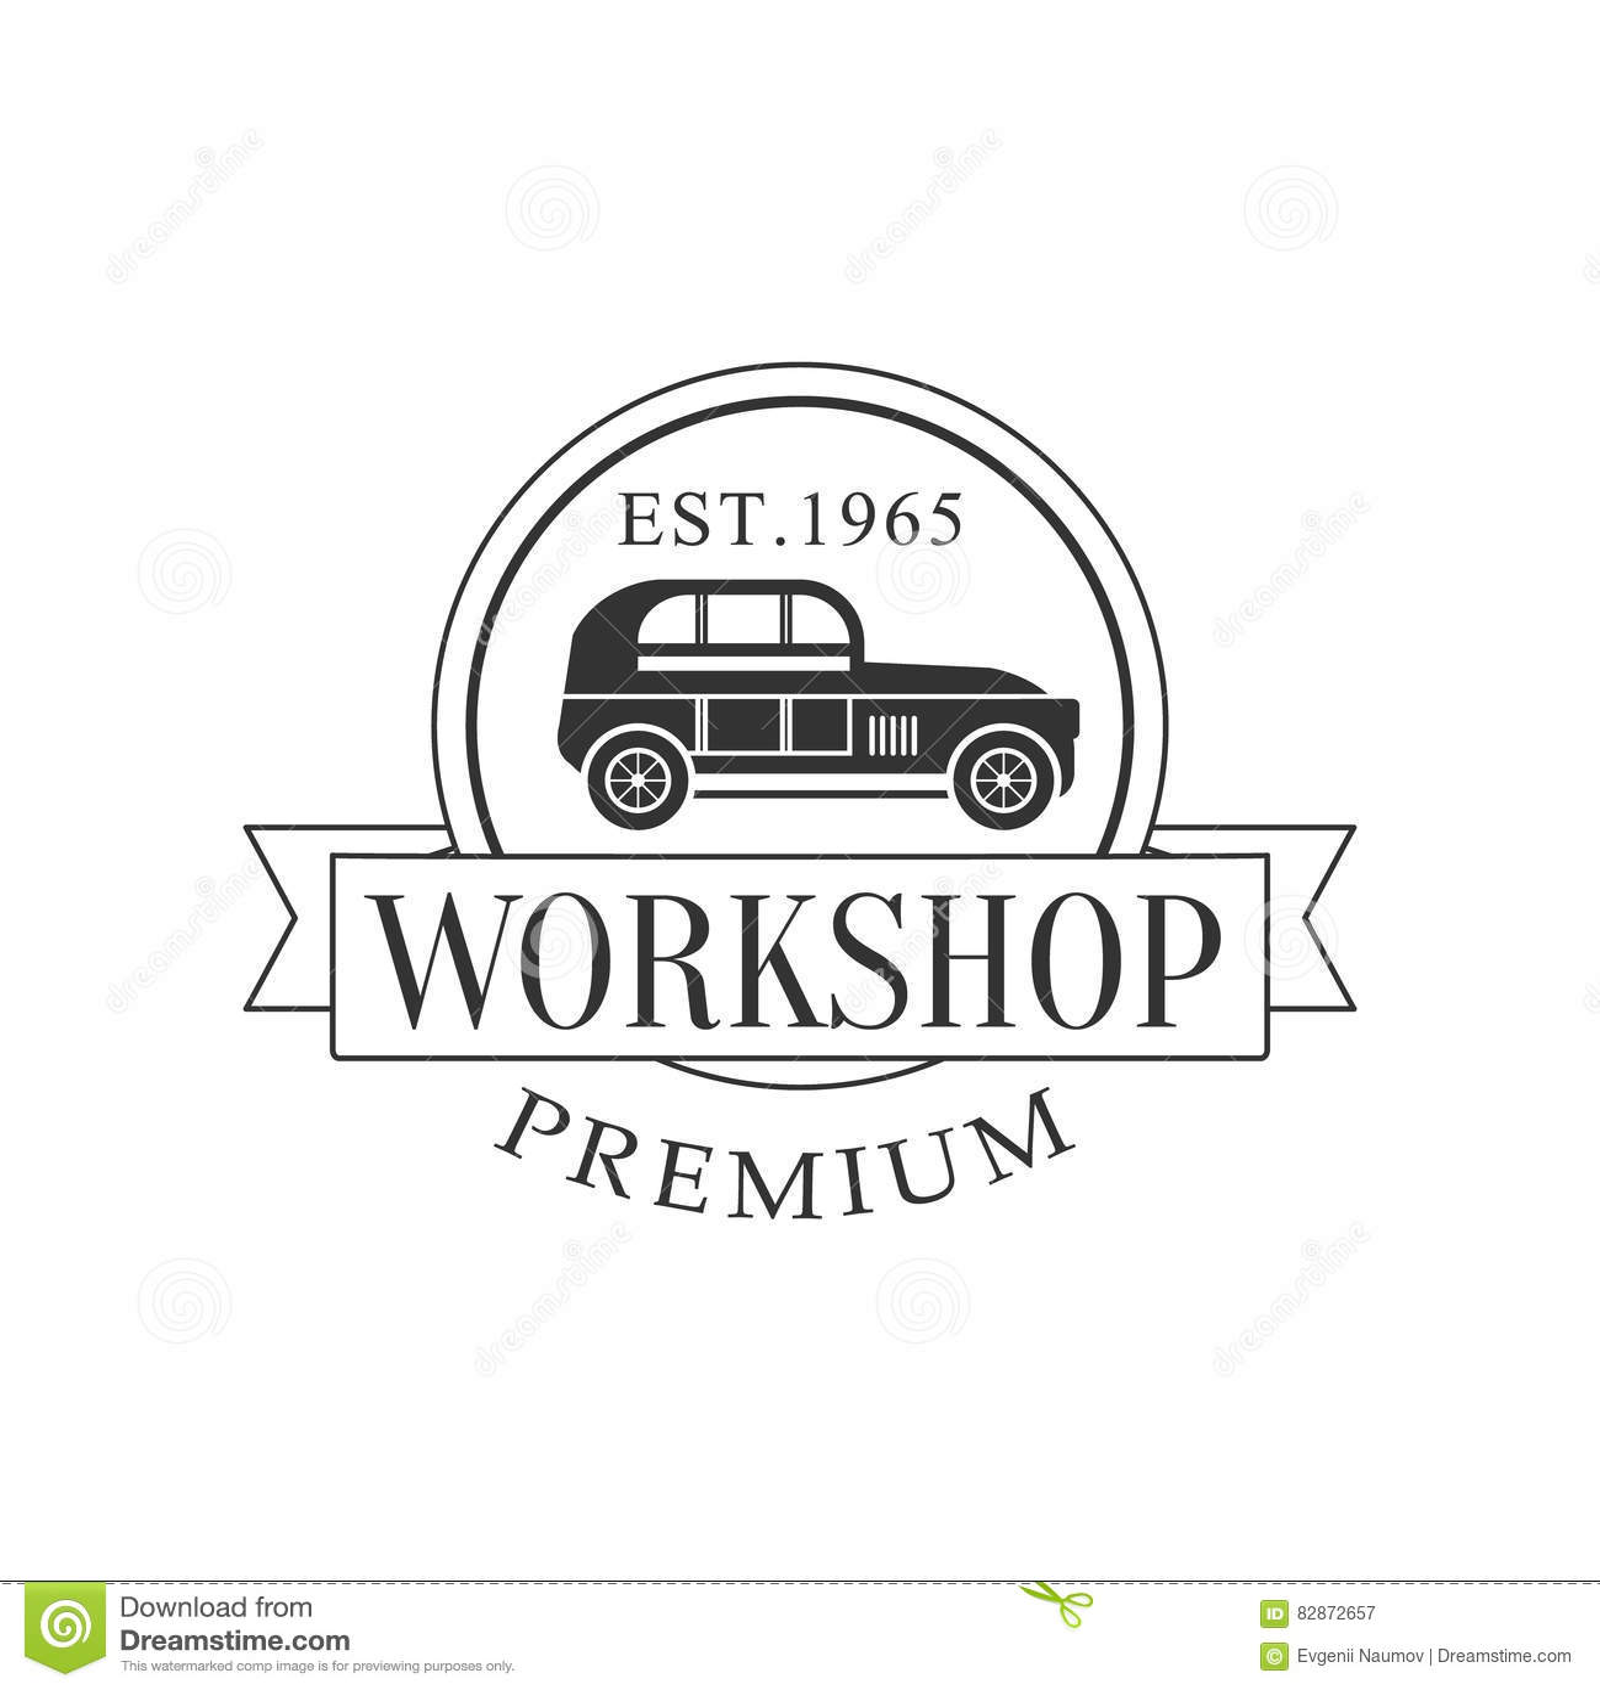 Design car repair workshop - Retro Car Repair Workshop Black And White Label Design Template With Round Frame And Ribbon Royalty